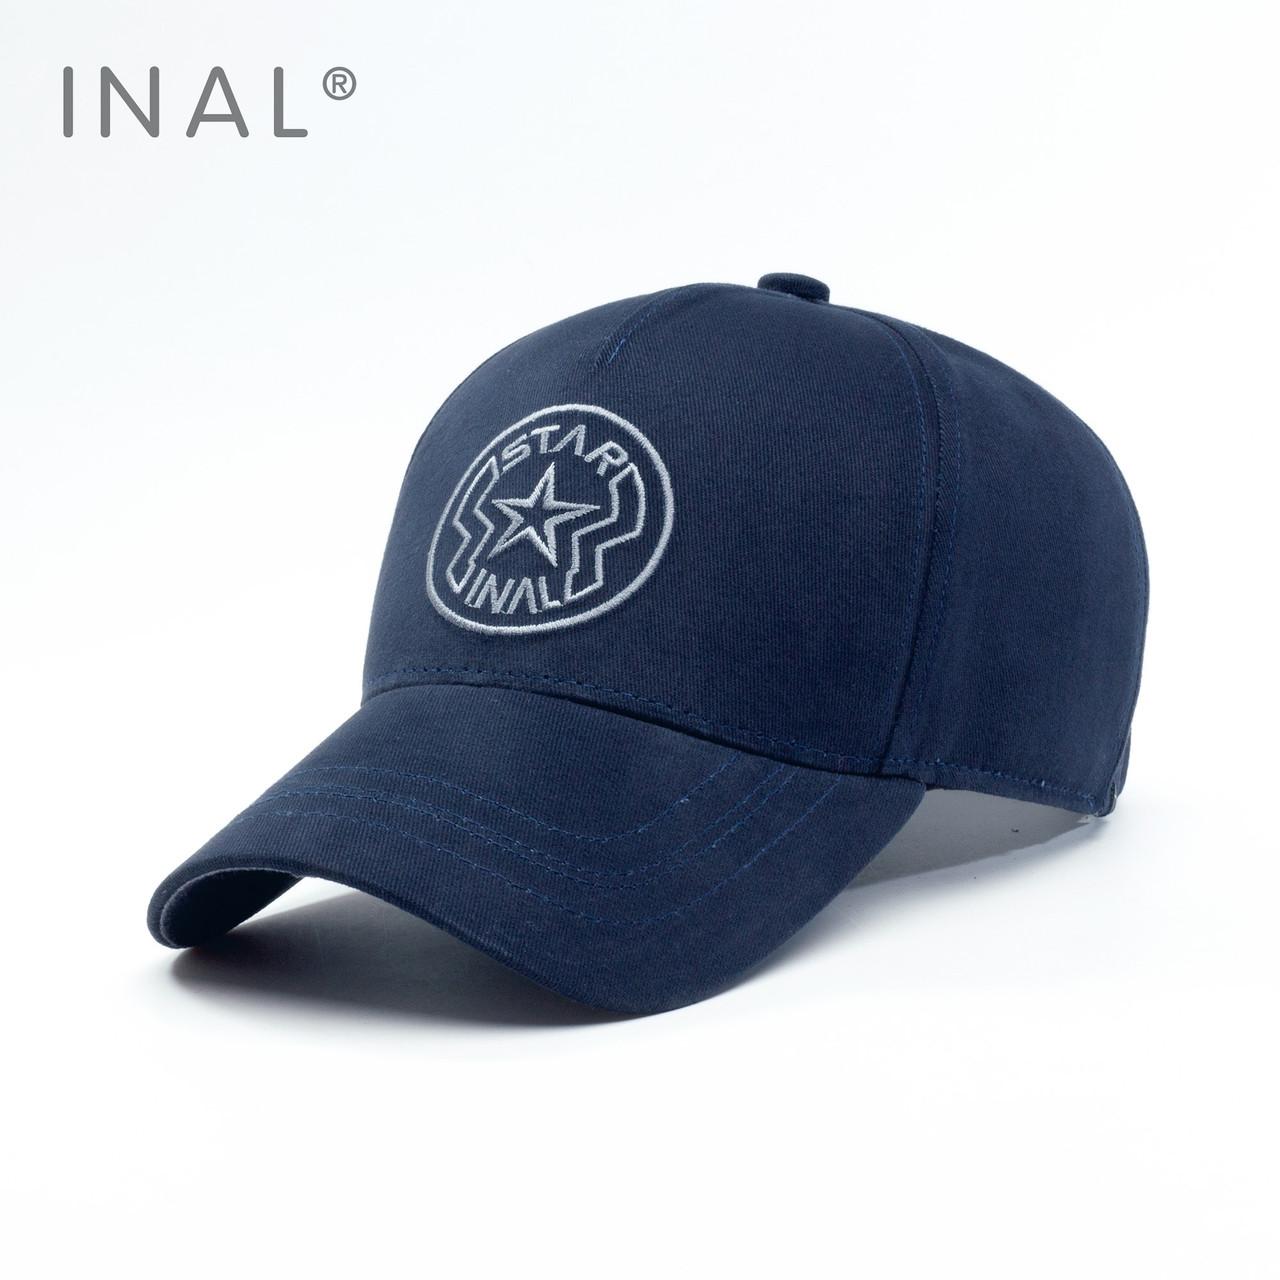 Кепка бейсболка INAL Star L / 57-58 RU Синий 152057